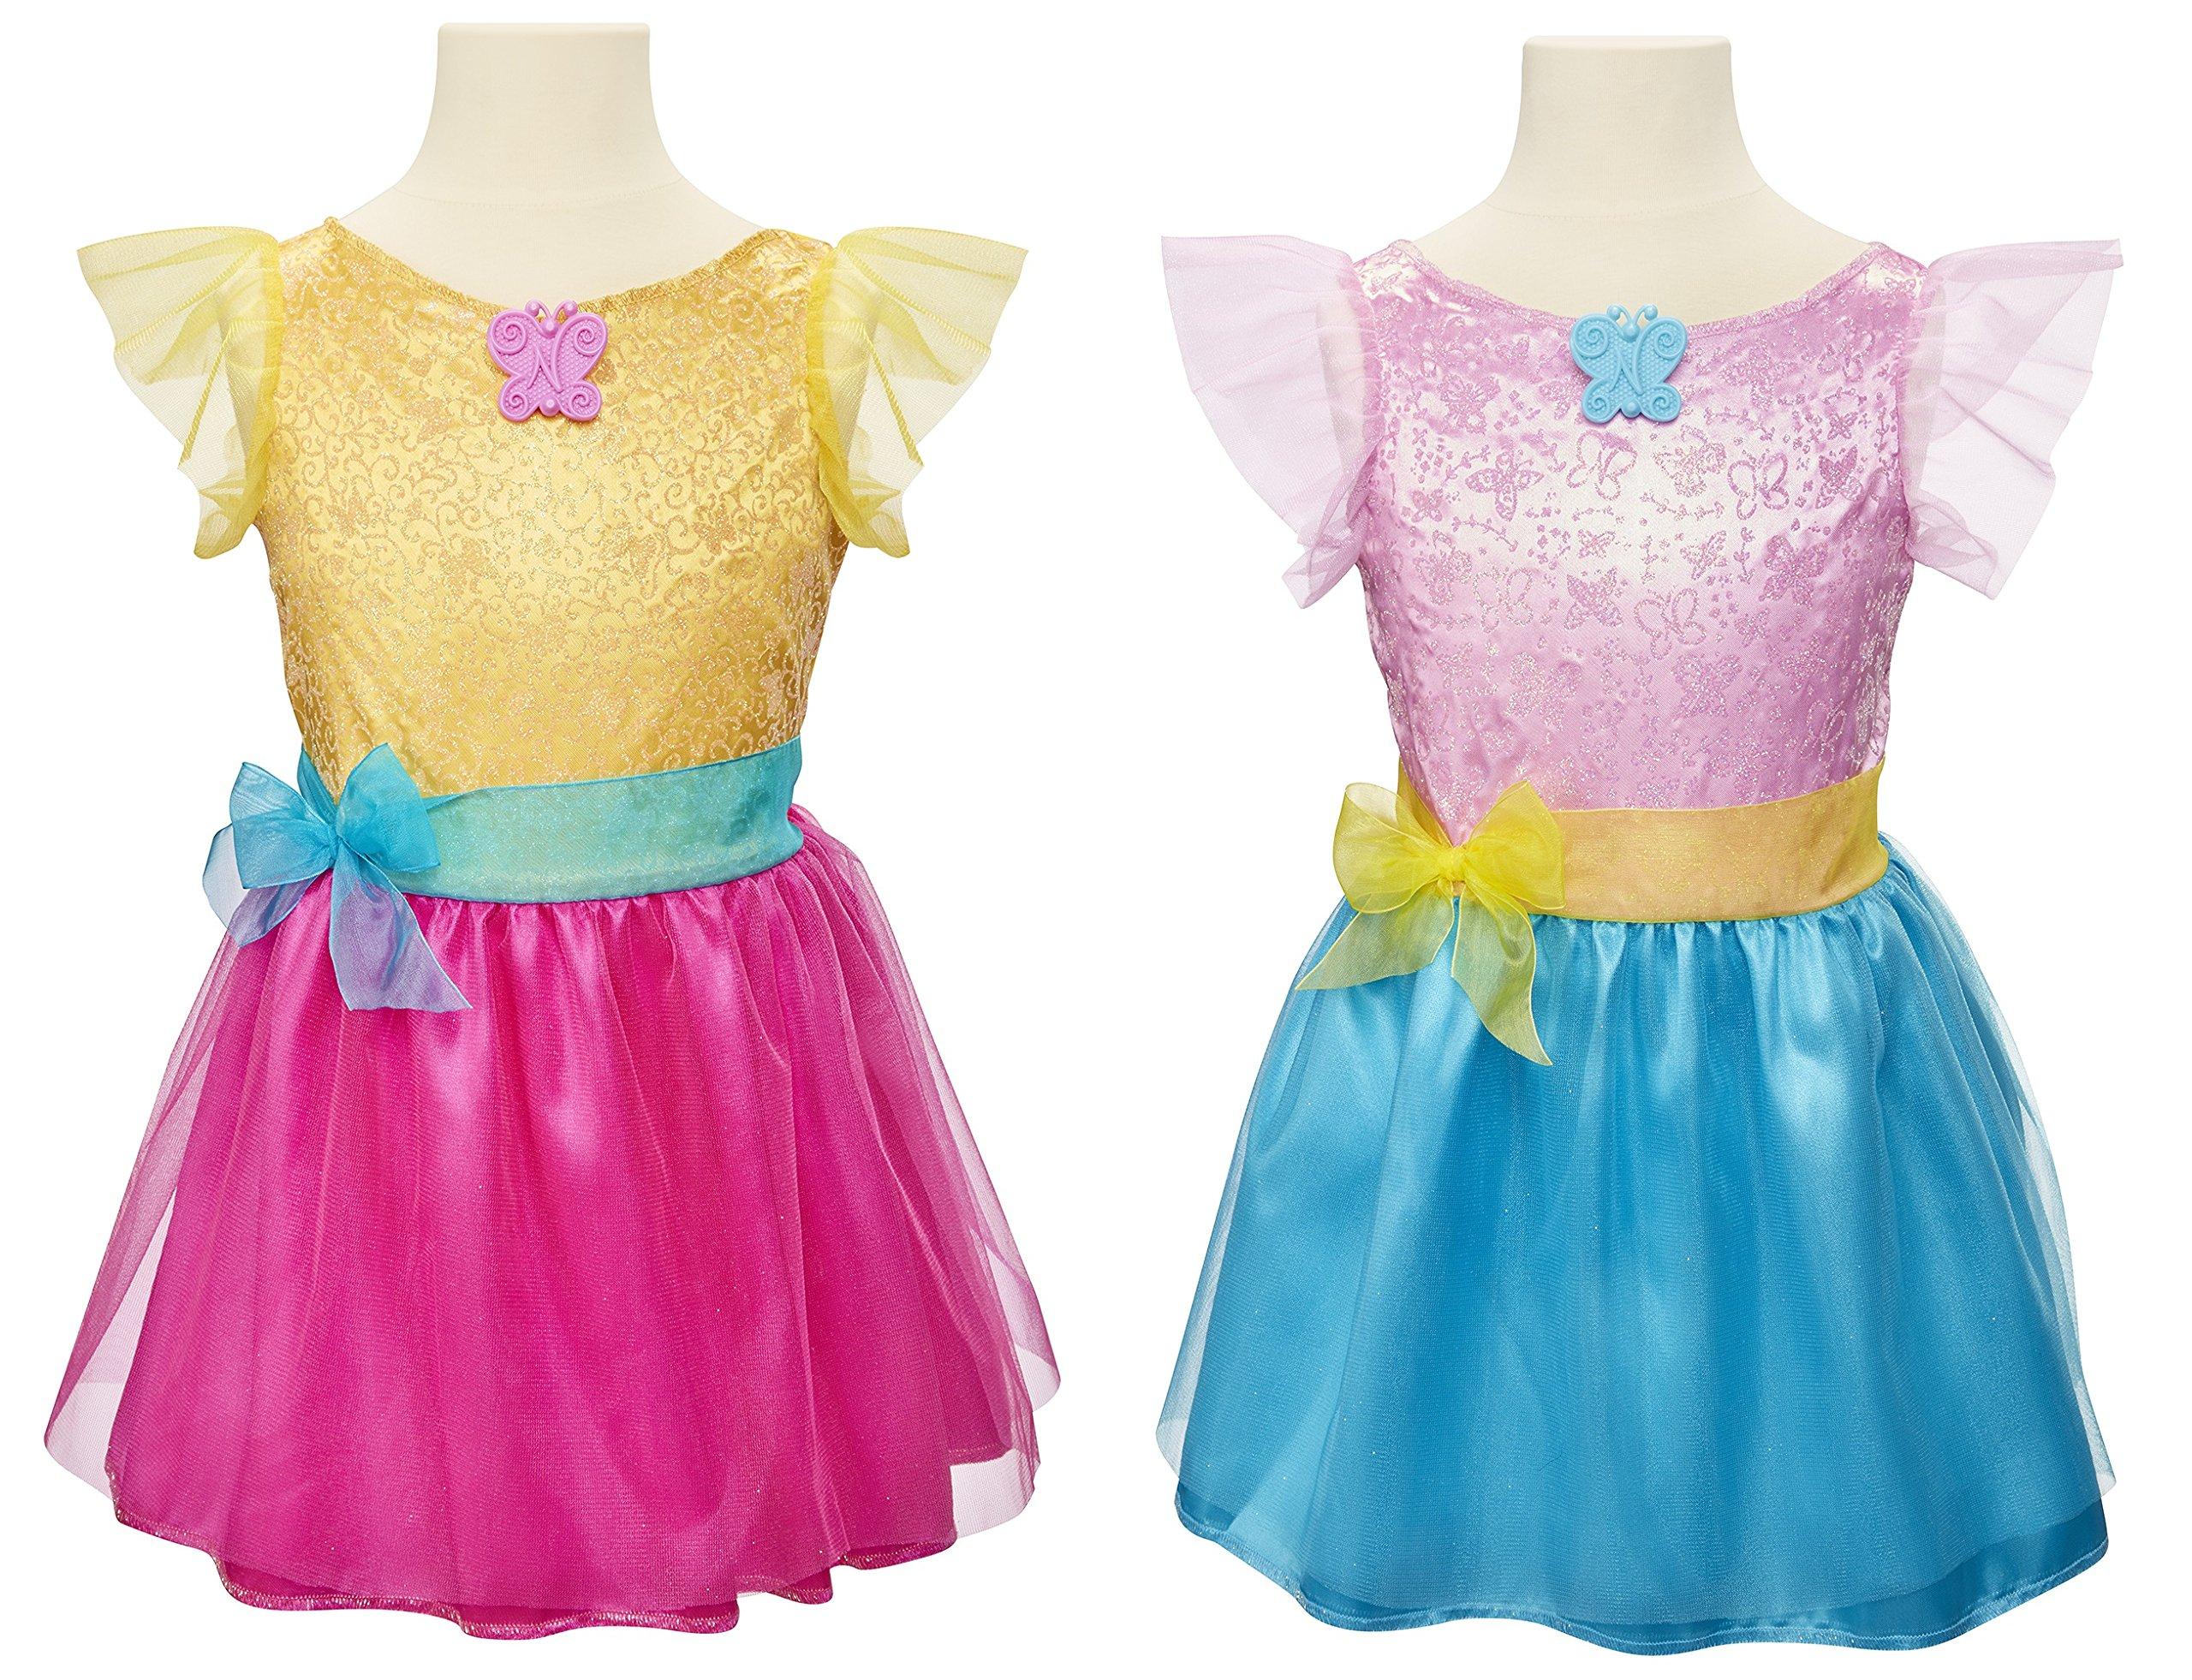 Fancy Nancy Ultimate Dress-Up Trunk, 13-Pieces, Fits Sizes 4-6X [Amazon Exclusive] by Fancy Nancy (Image #4)